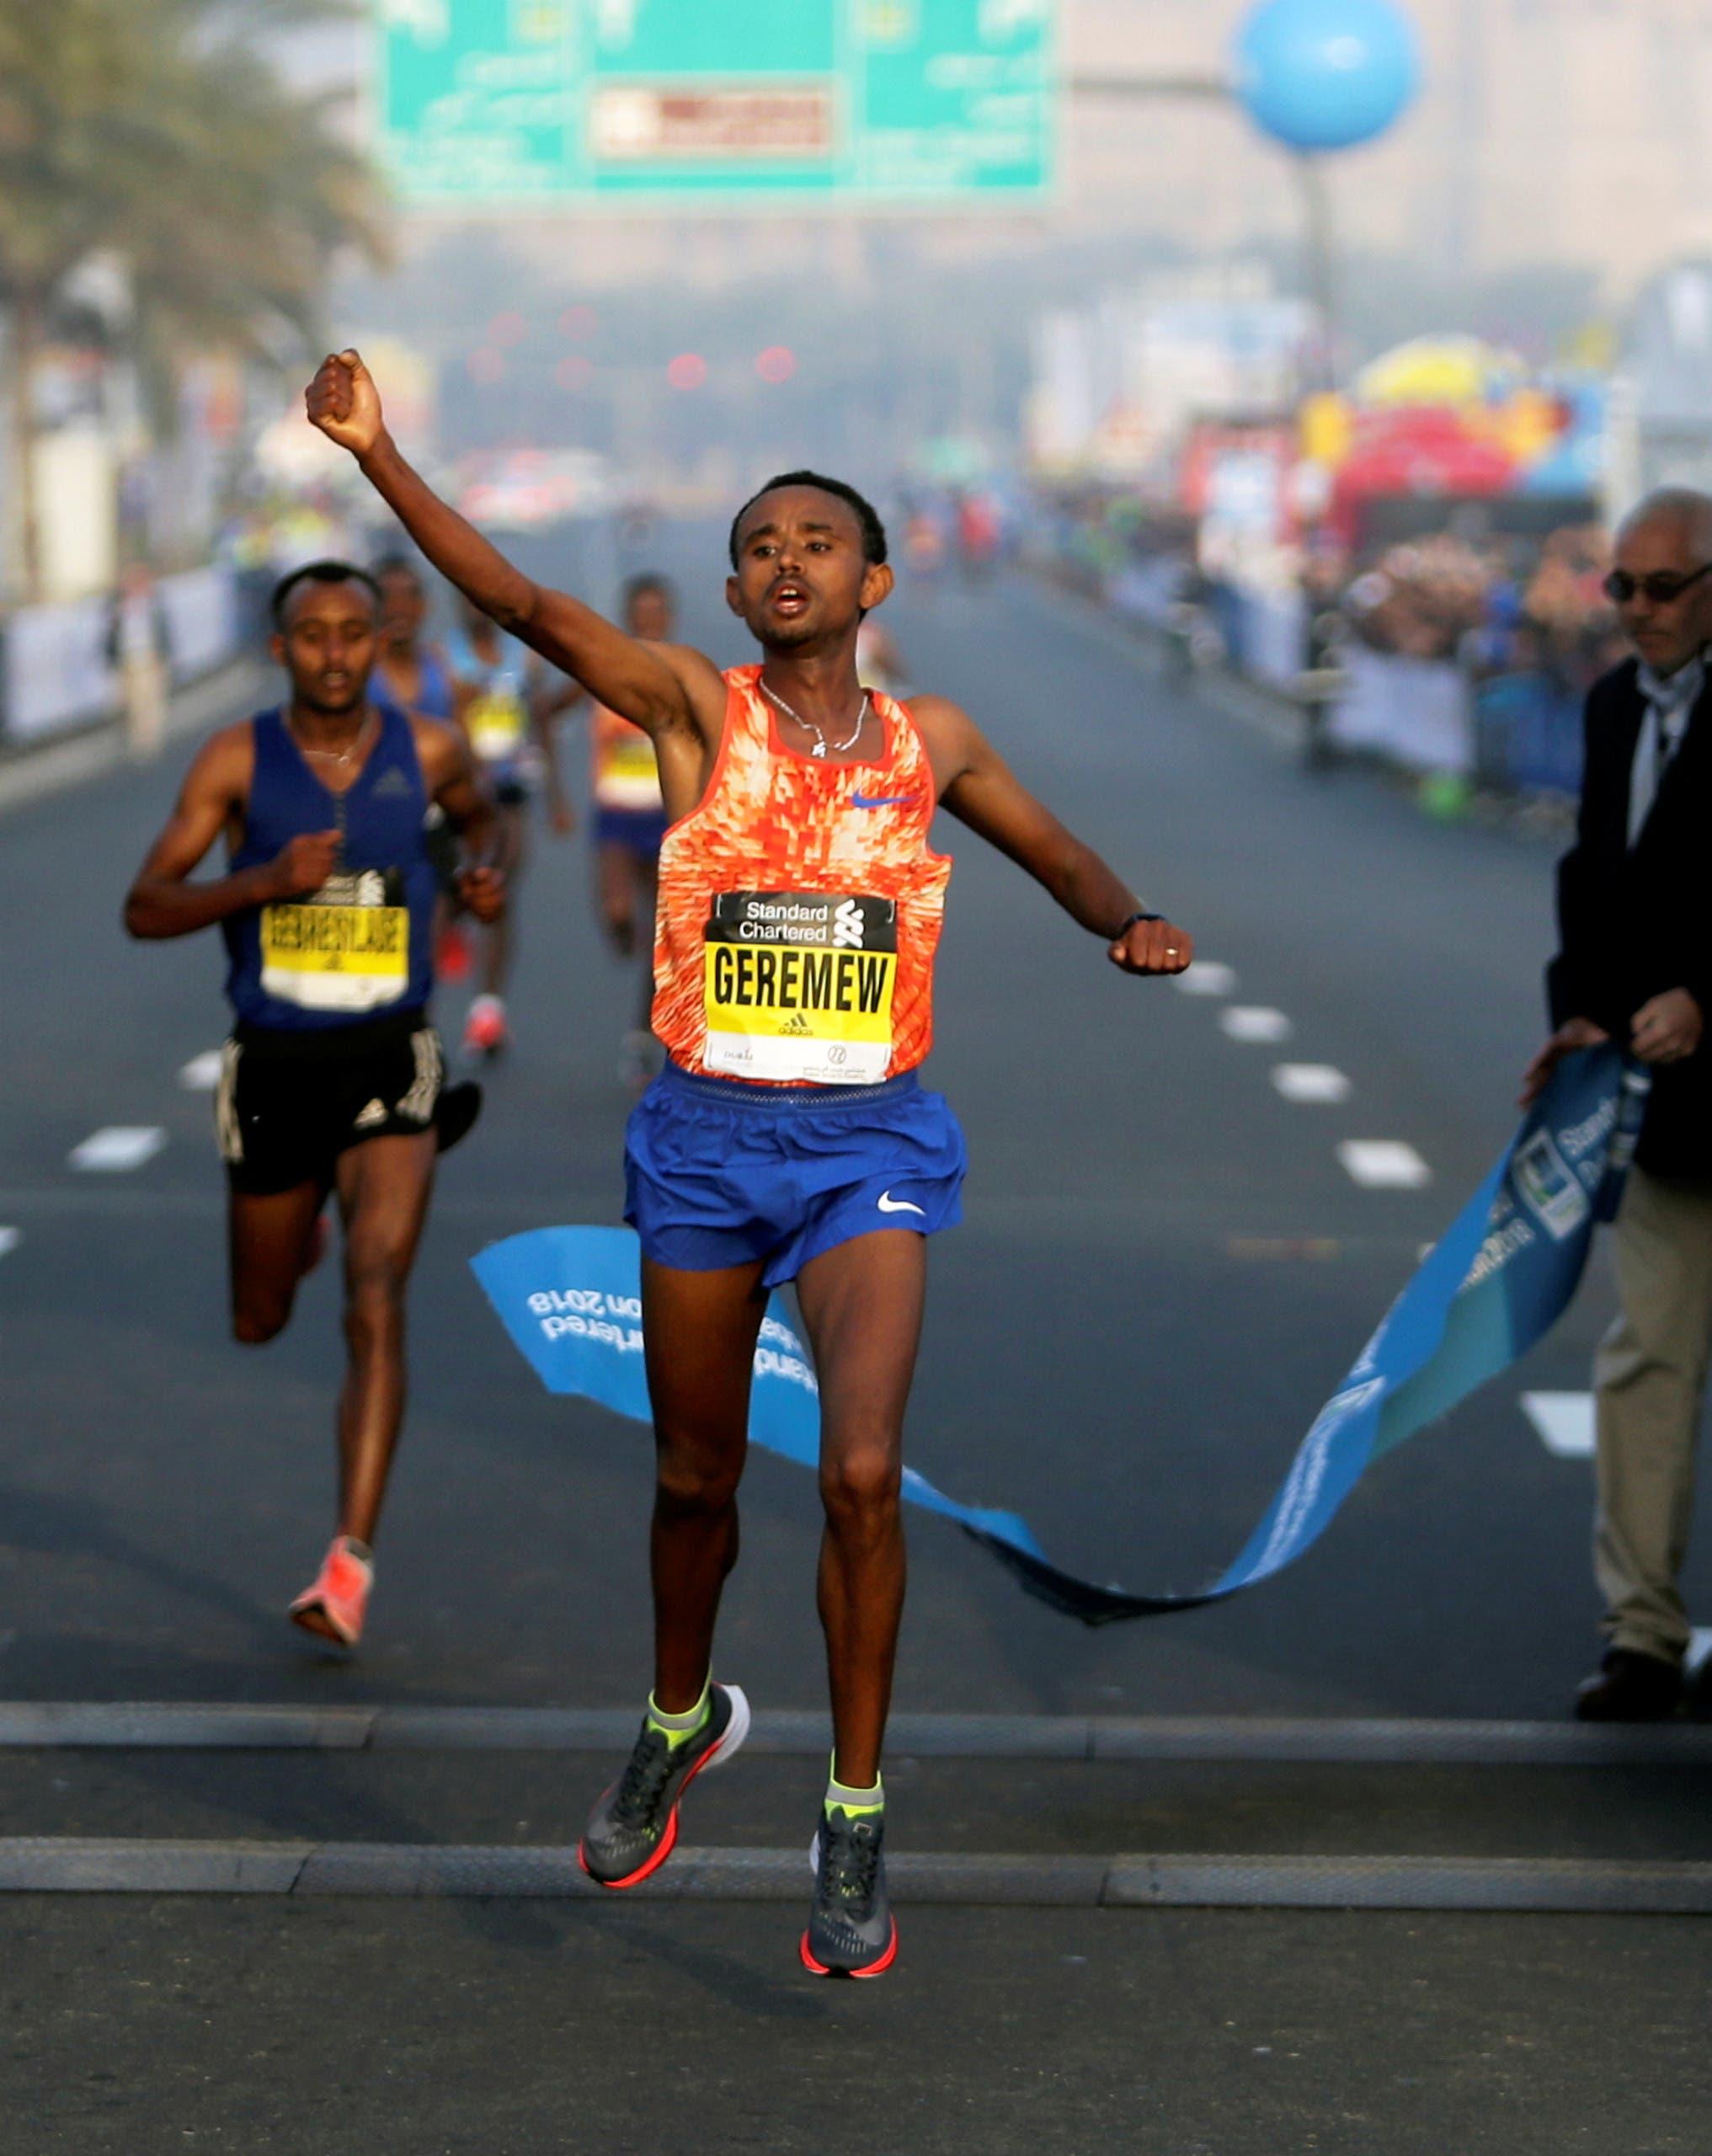 Geremew Bayih of Ethiopia crosses the finish line at the Dubai Marathon in Dubai, UAE January 26, 2018. REUTERS